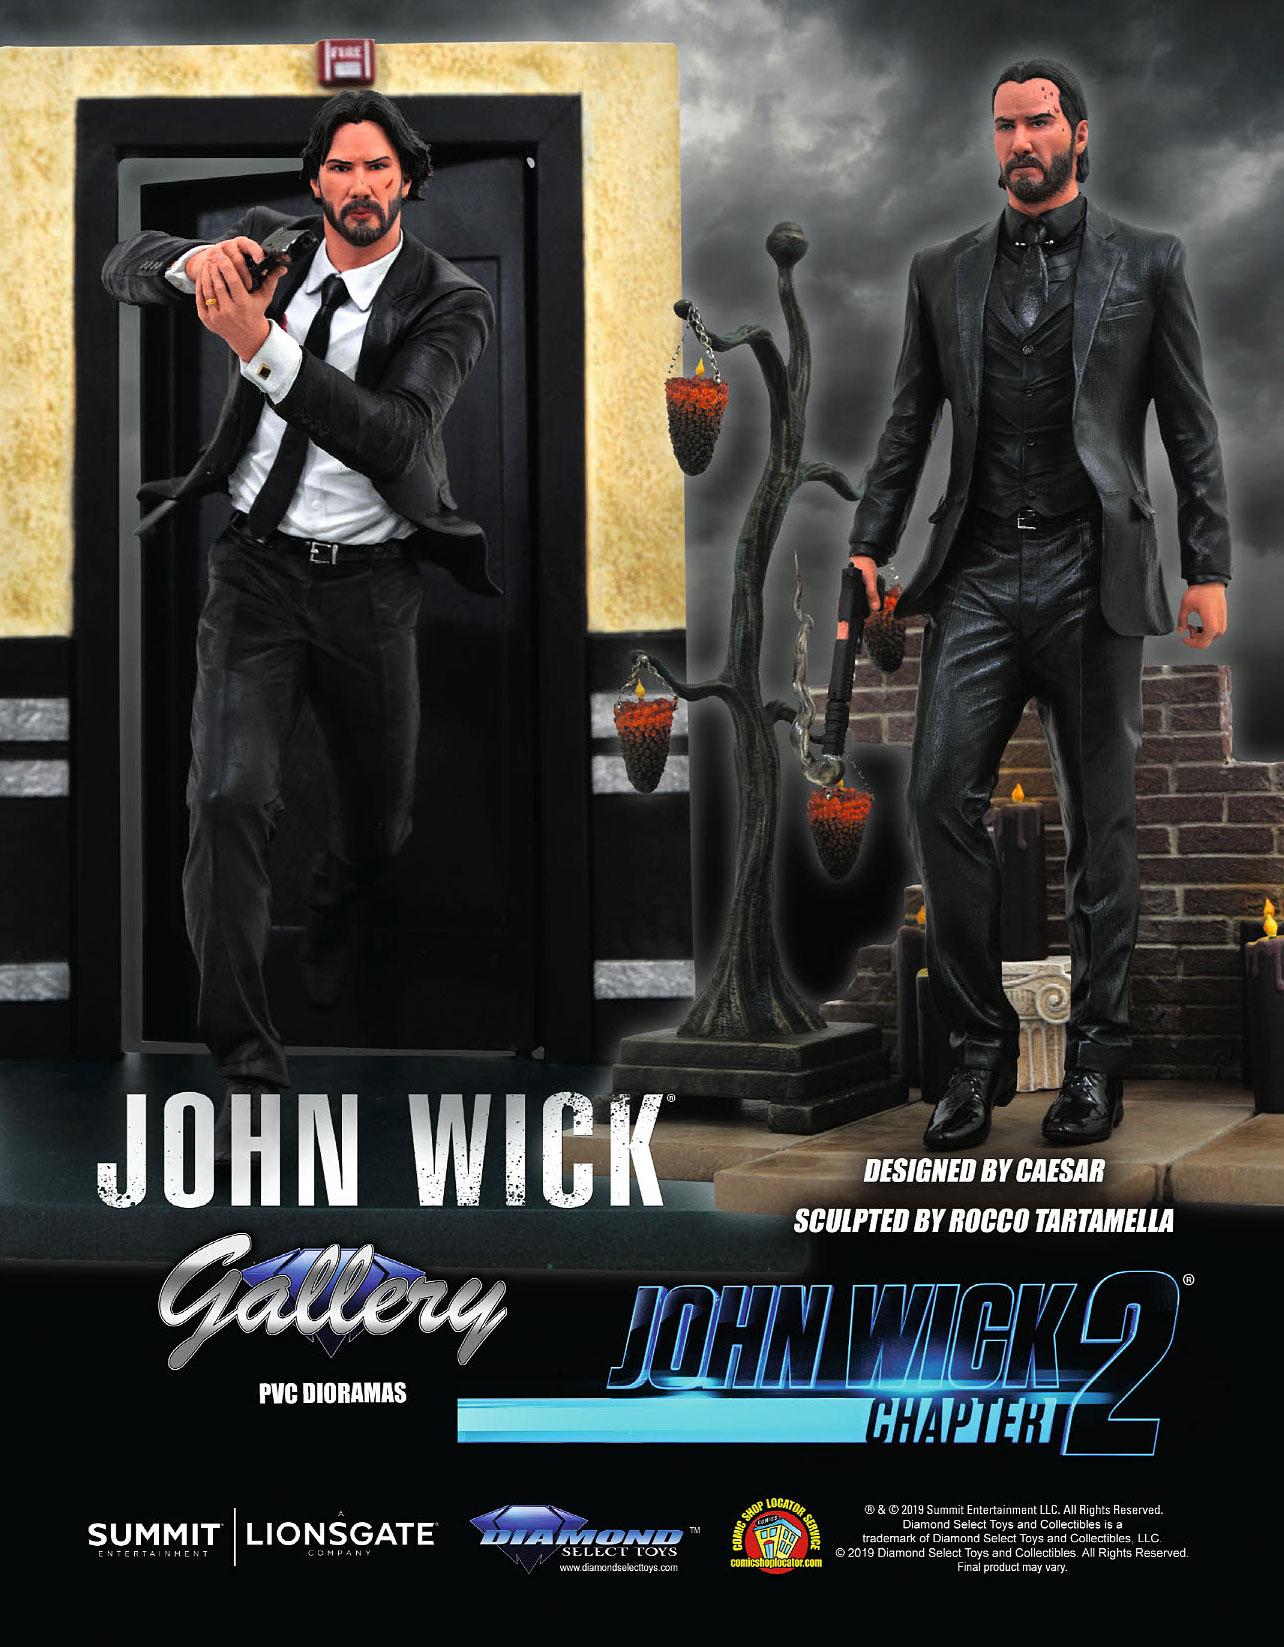 Keanu Reeves Vinimates John Wick Film JOHN WICK Vinyl Figure